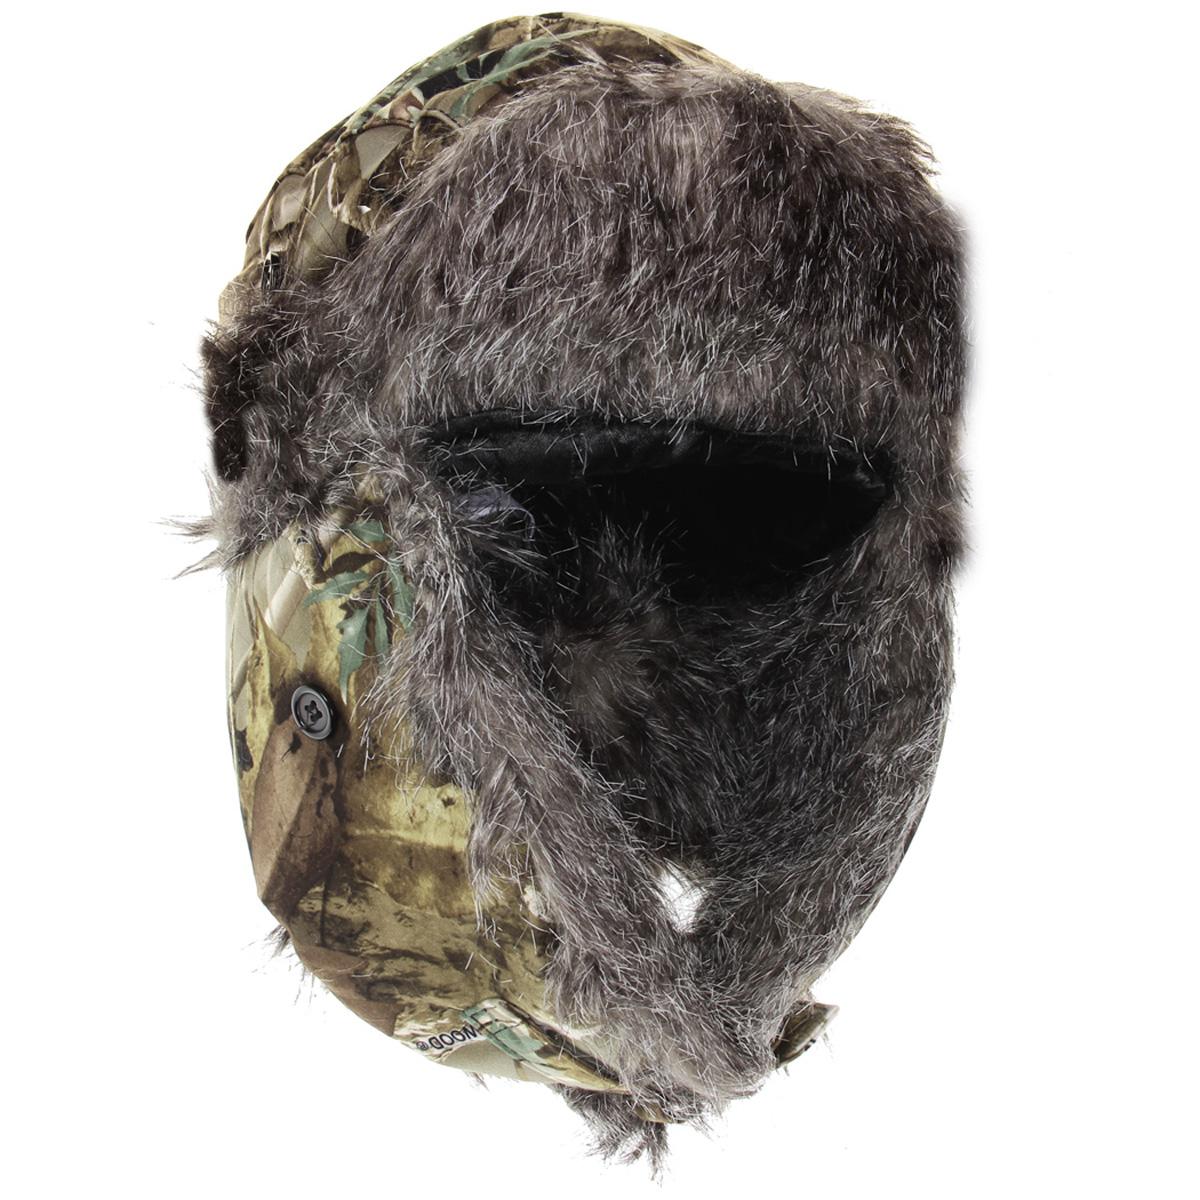 Шапка-ушанка Norfin Passion, цвет: лес. 750. Размер XL (60/61) шапки ушанки olle шапка ушанка